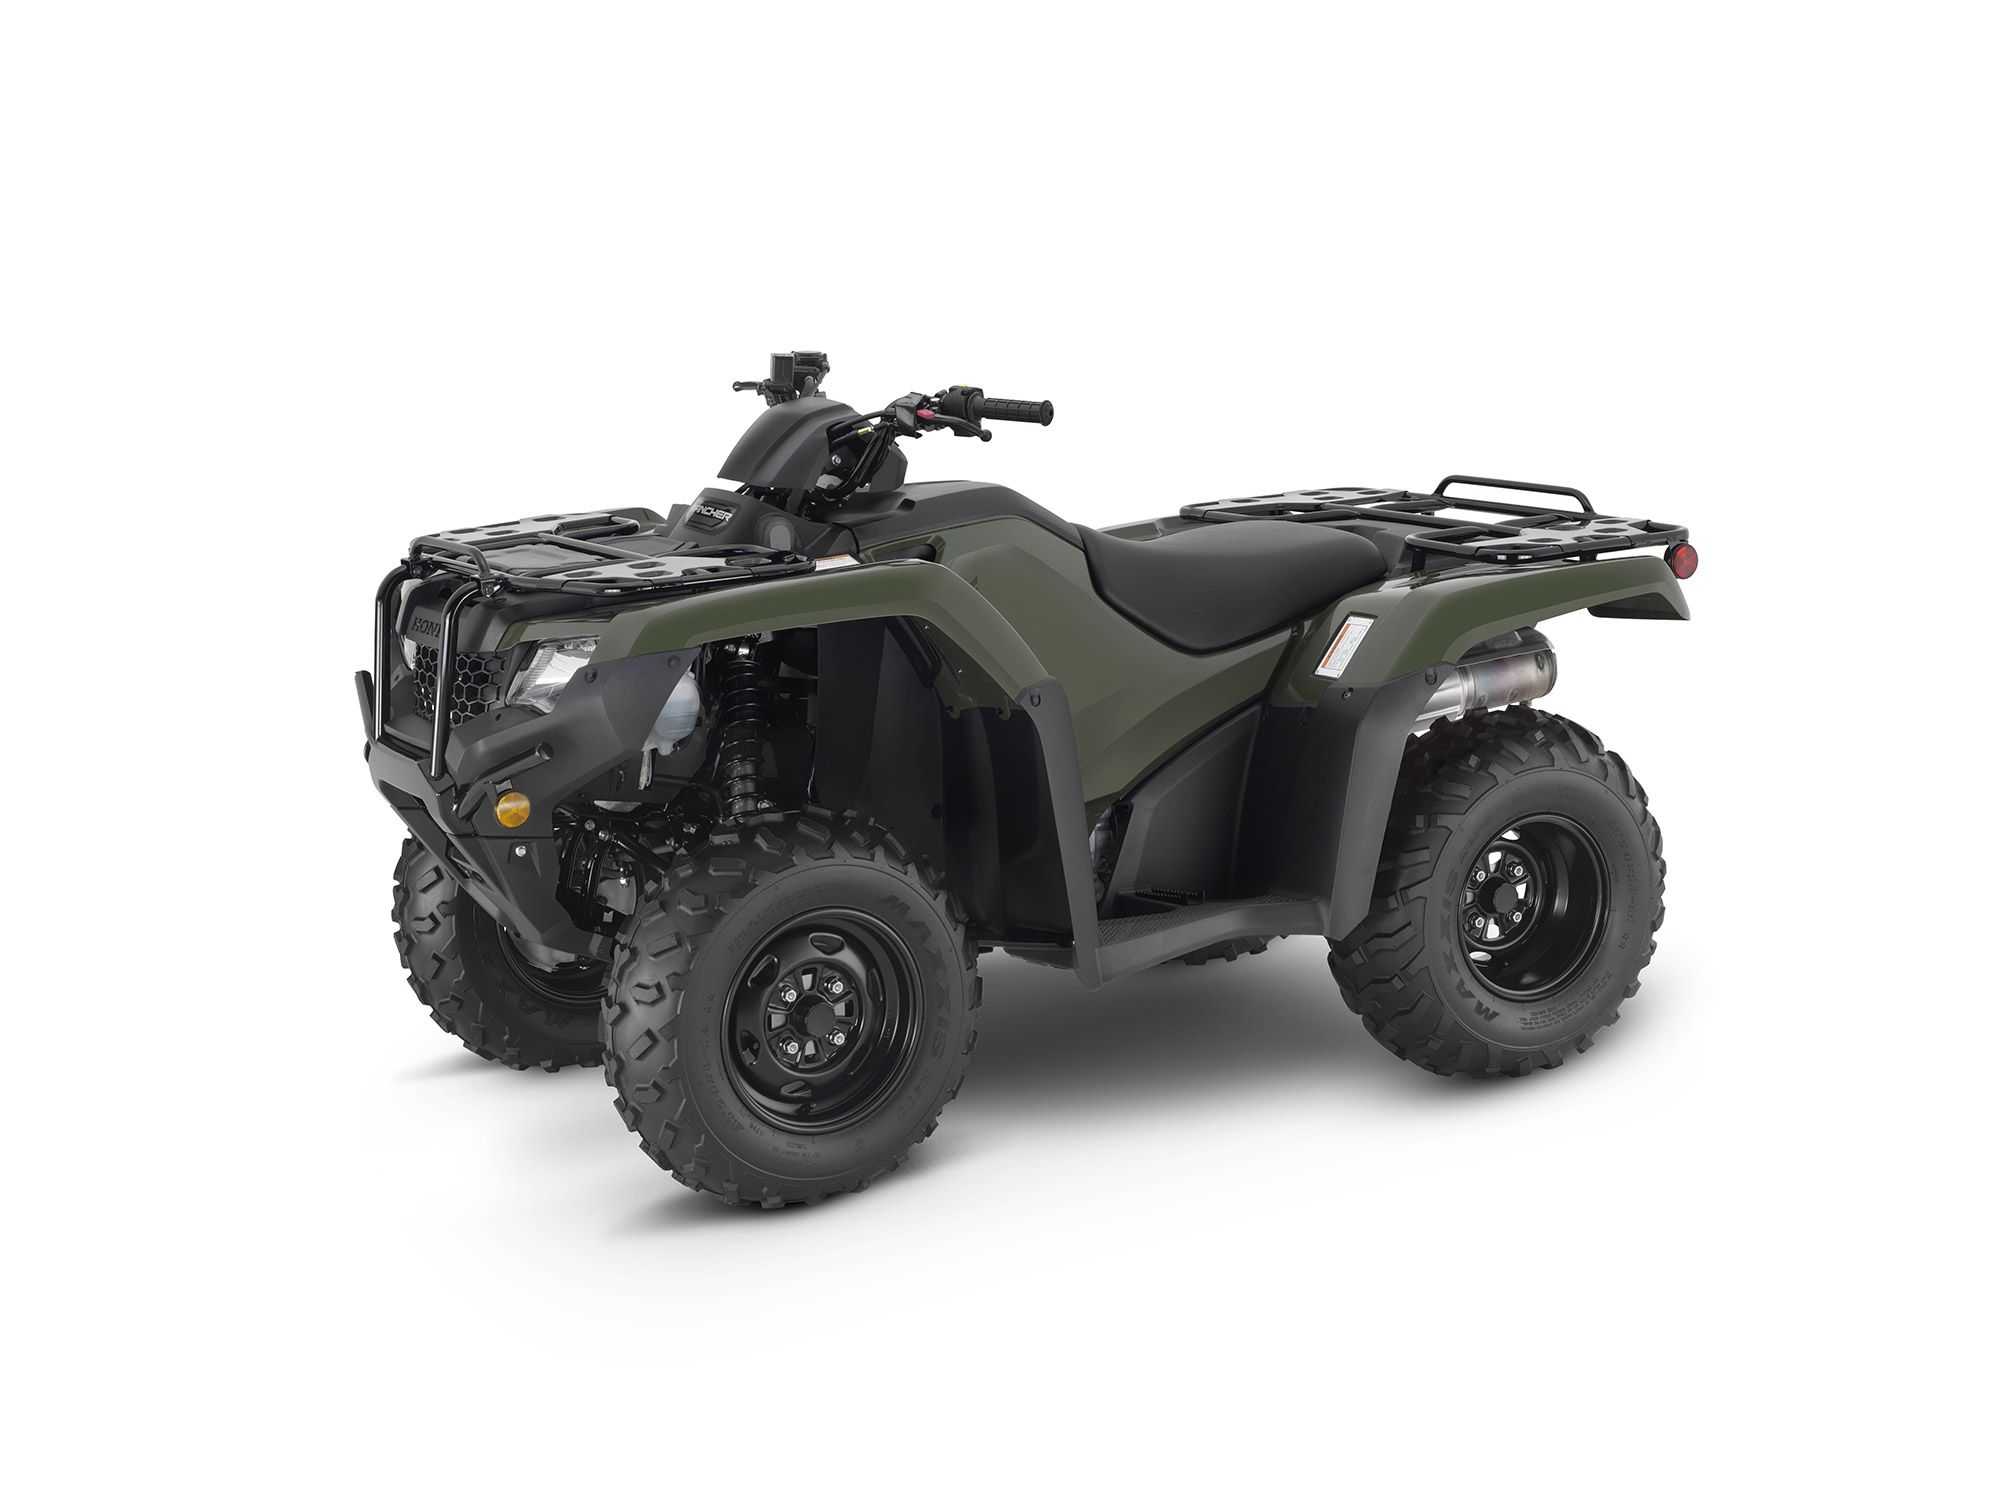 2022 FourTrax Rancher in base trim.